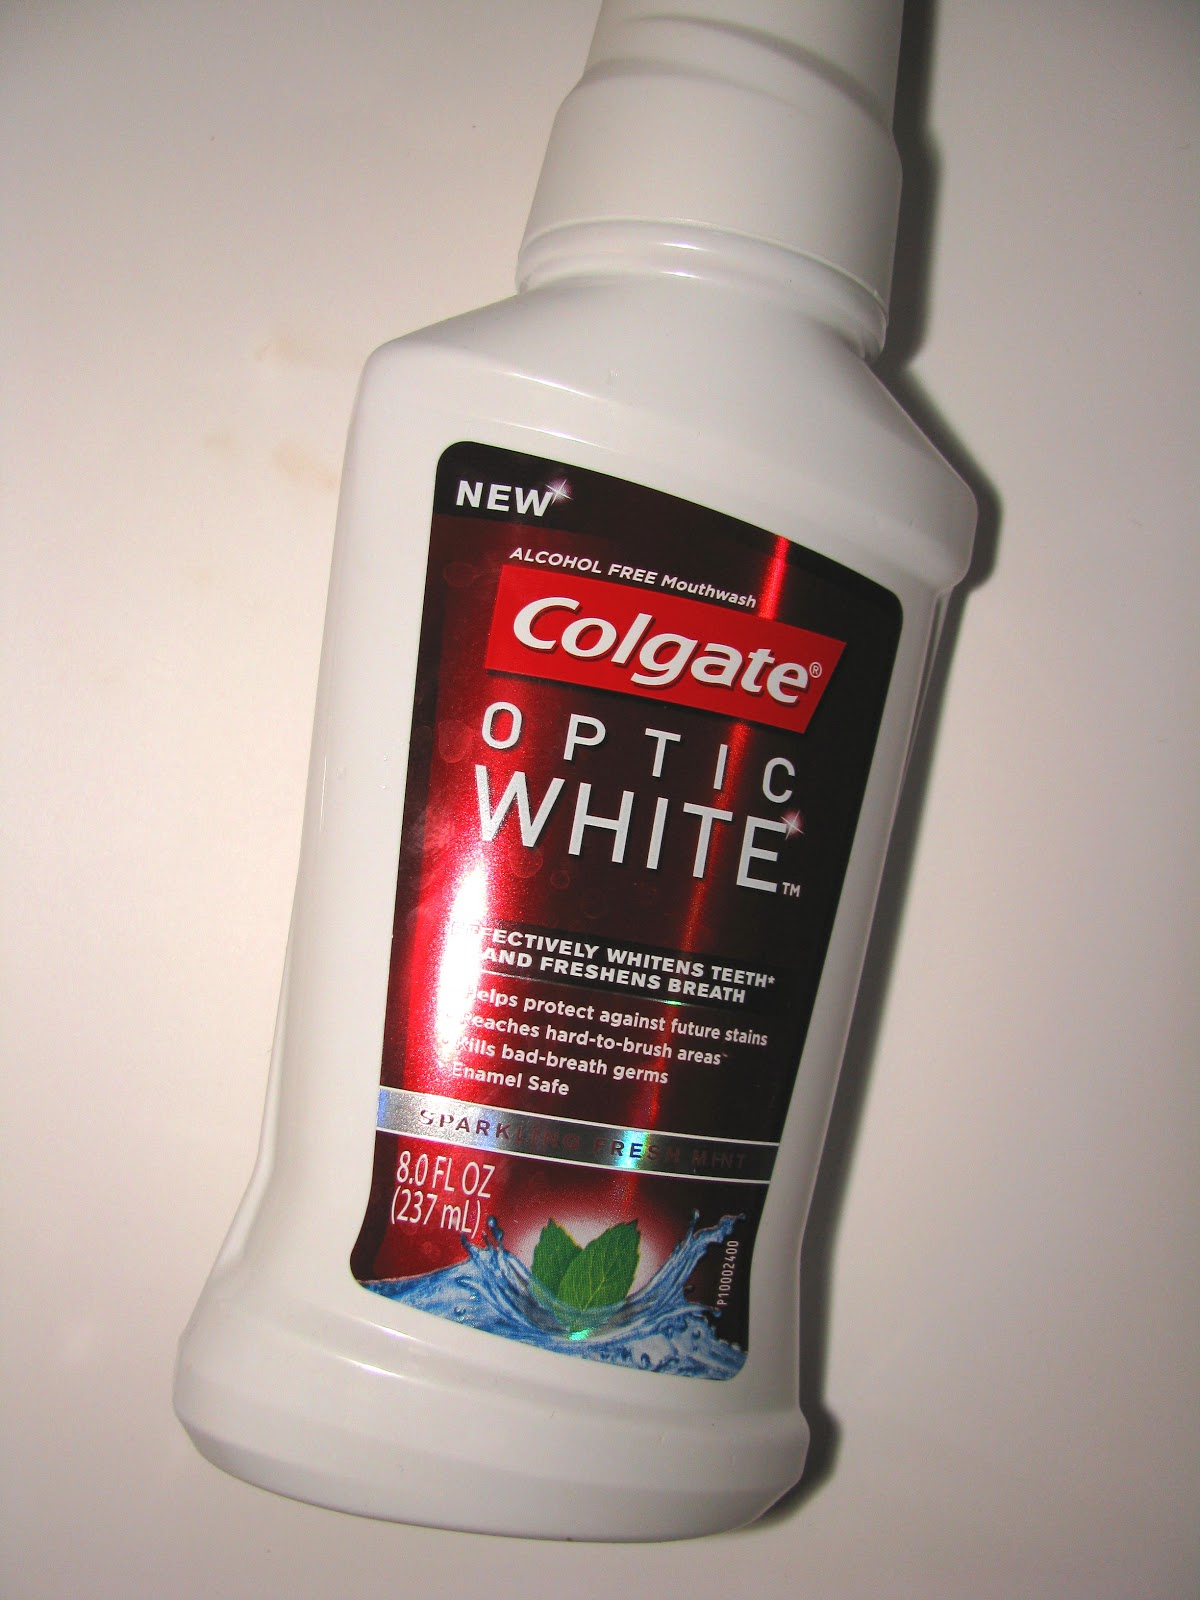 Colgate Optic White Review >> The Beauty Alchemist: Colgate Optic White Mouthwash